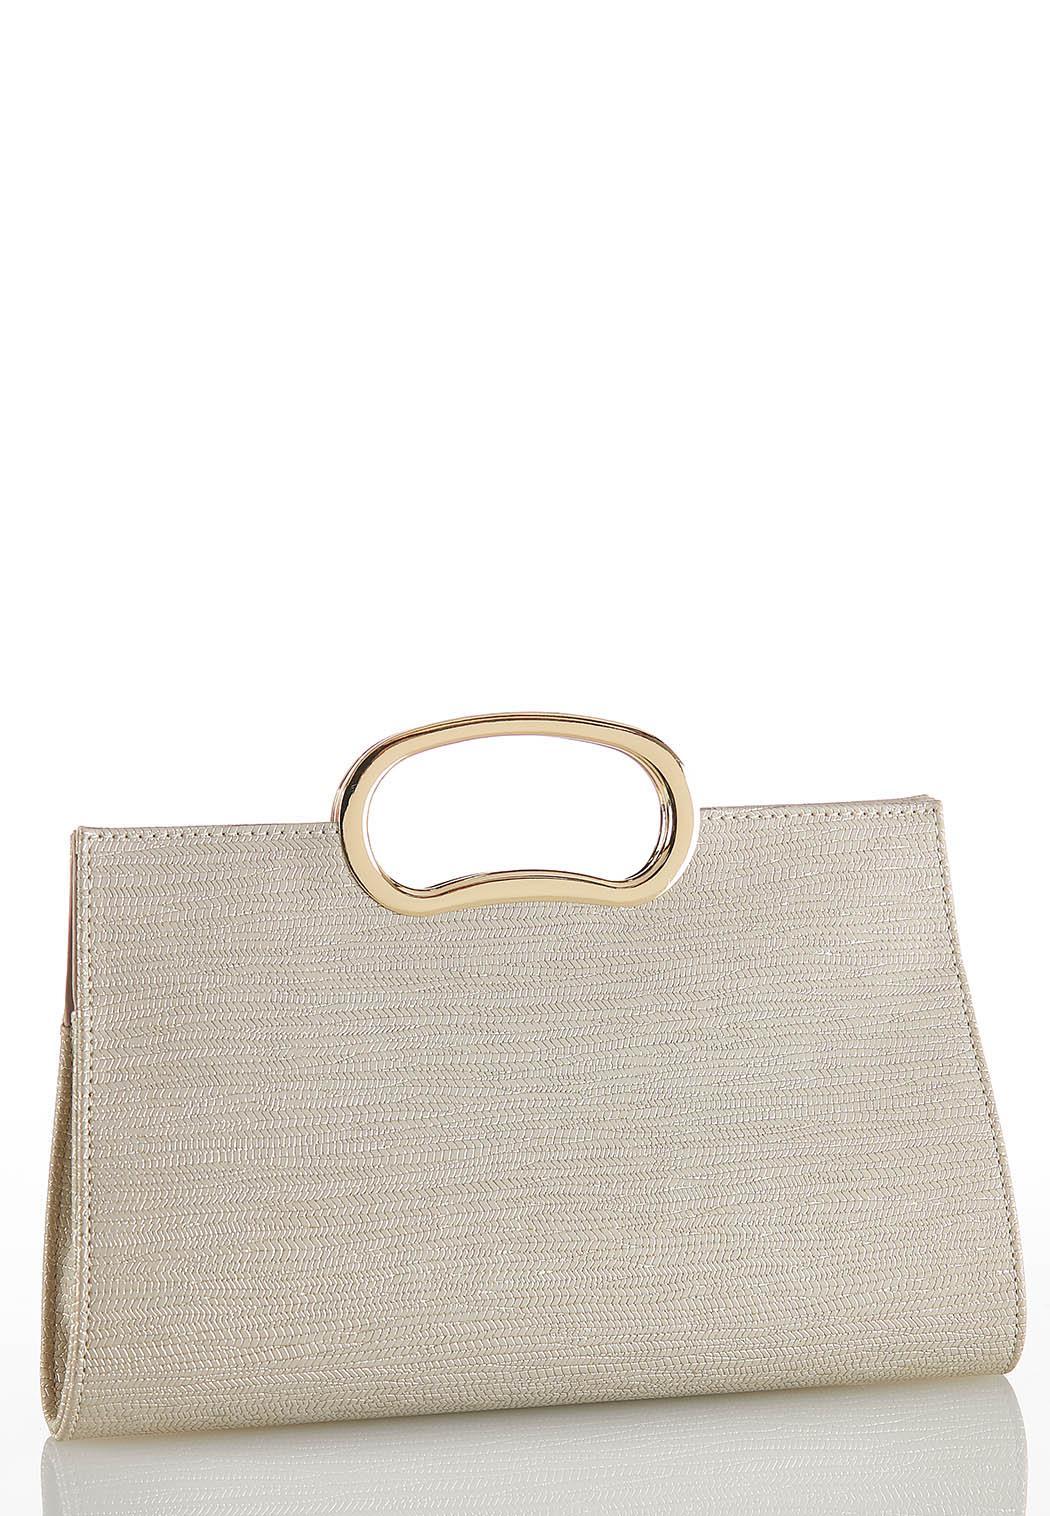 Metallic Ring Handle Clutch